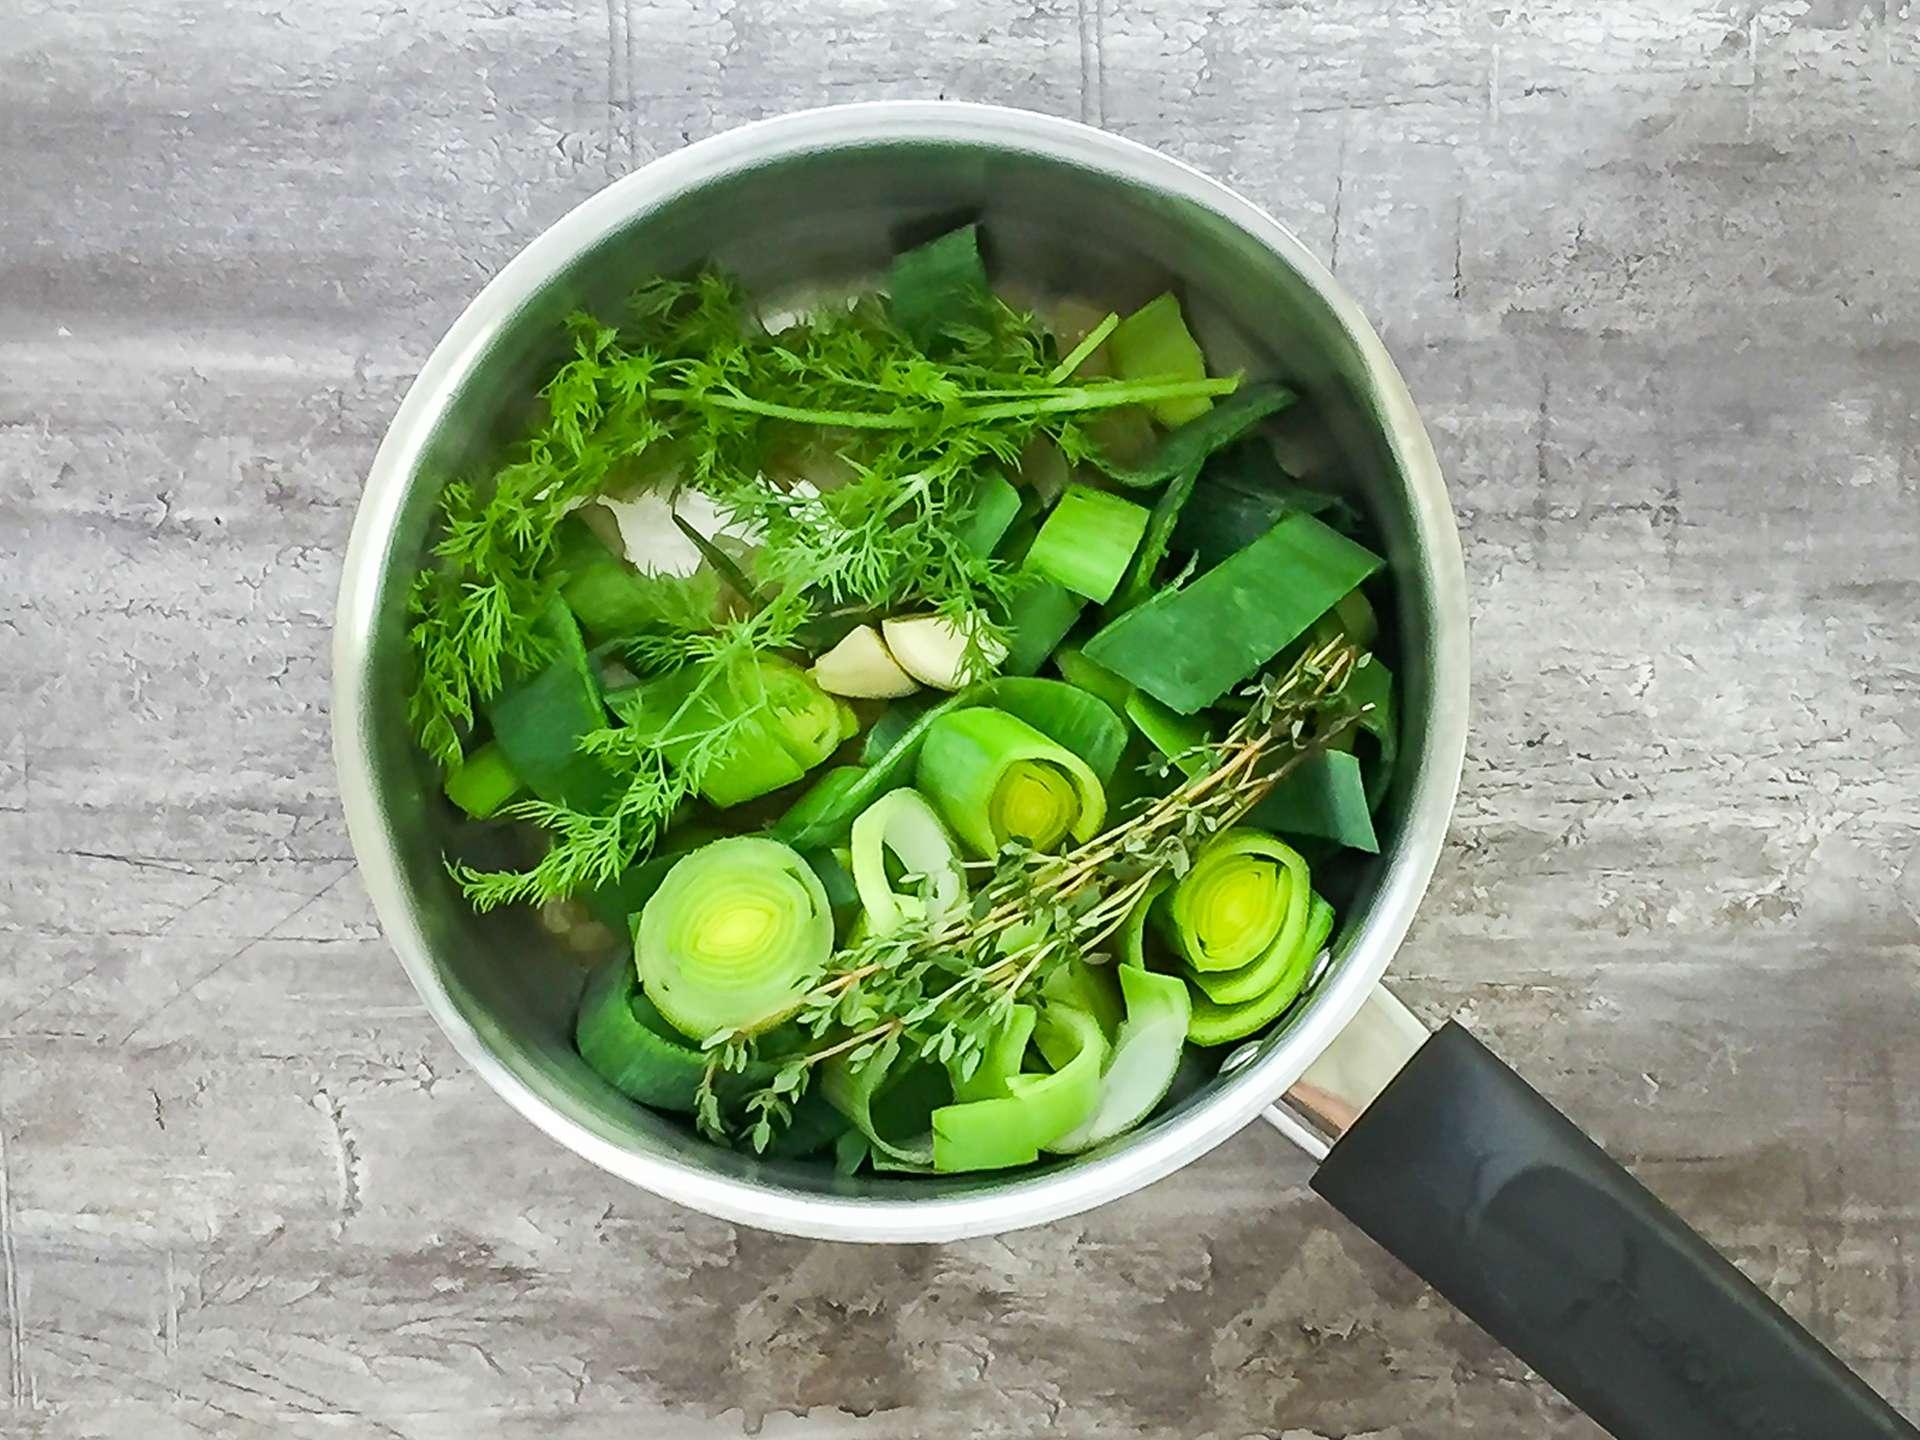 Leeks and herbs